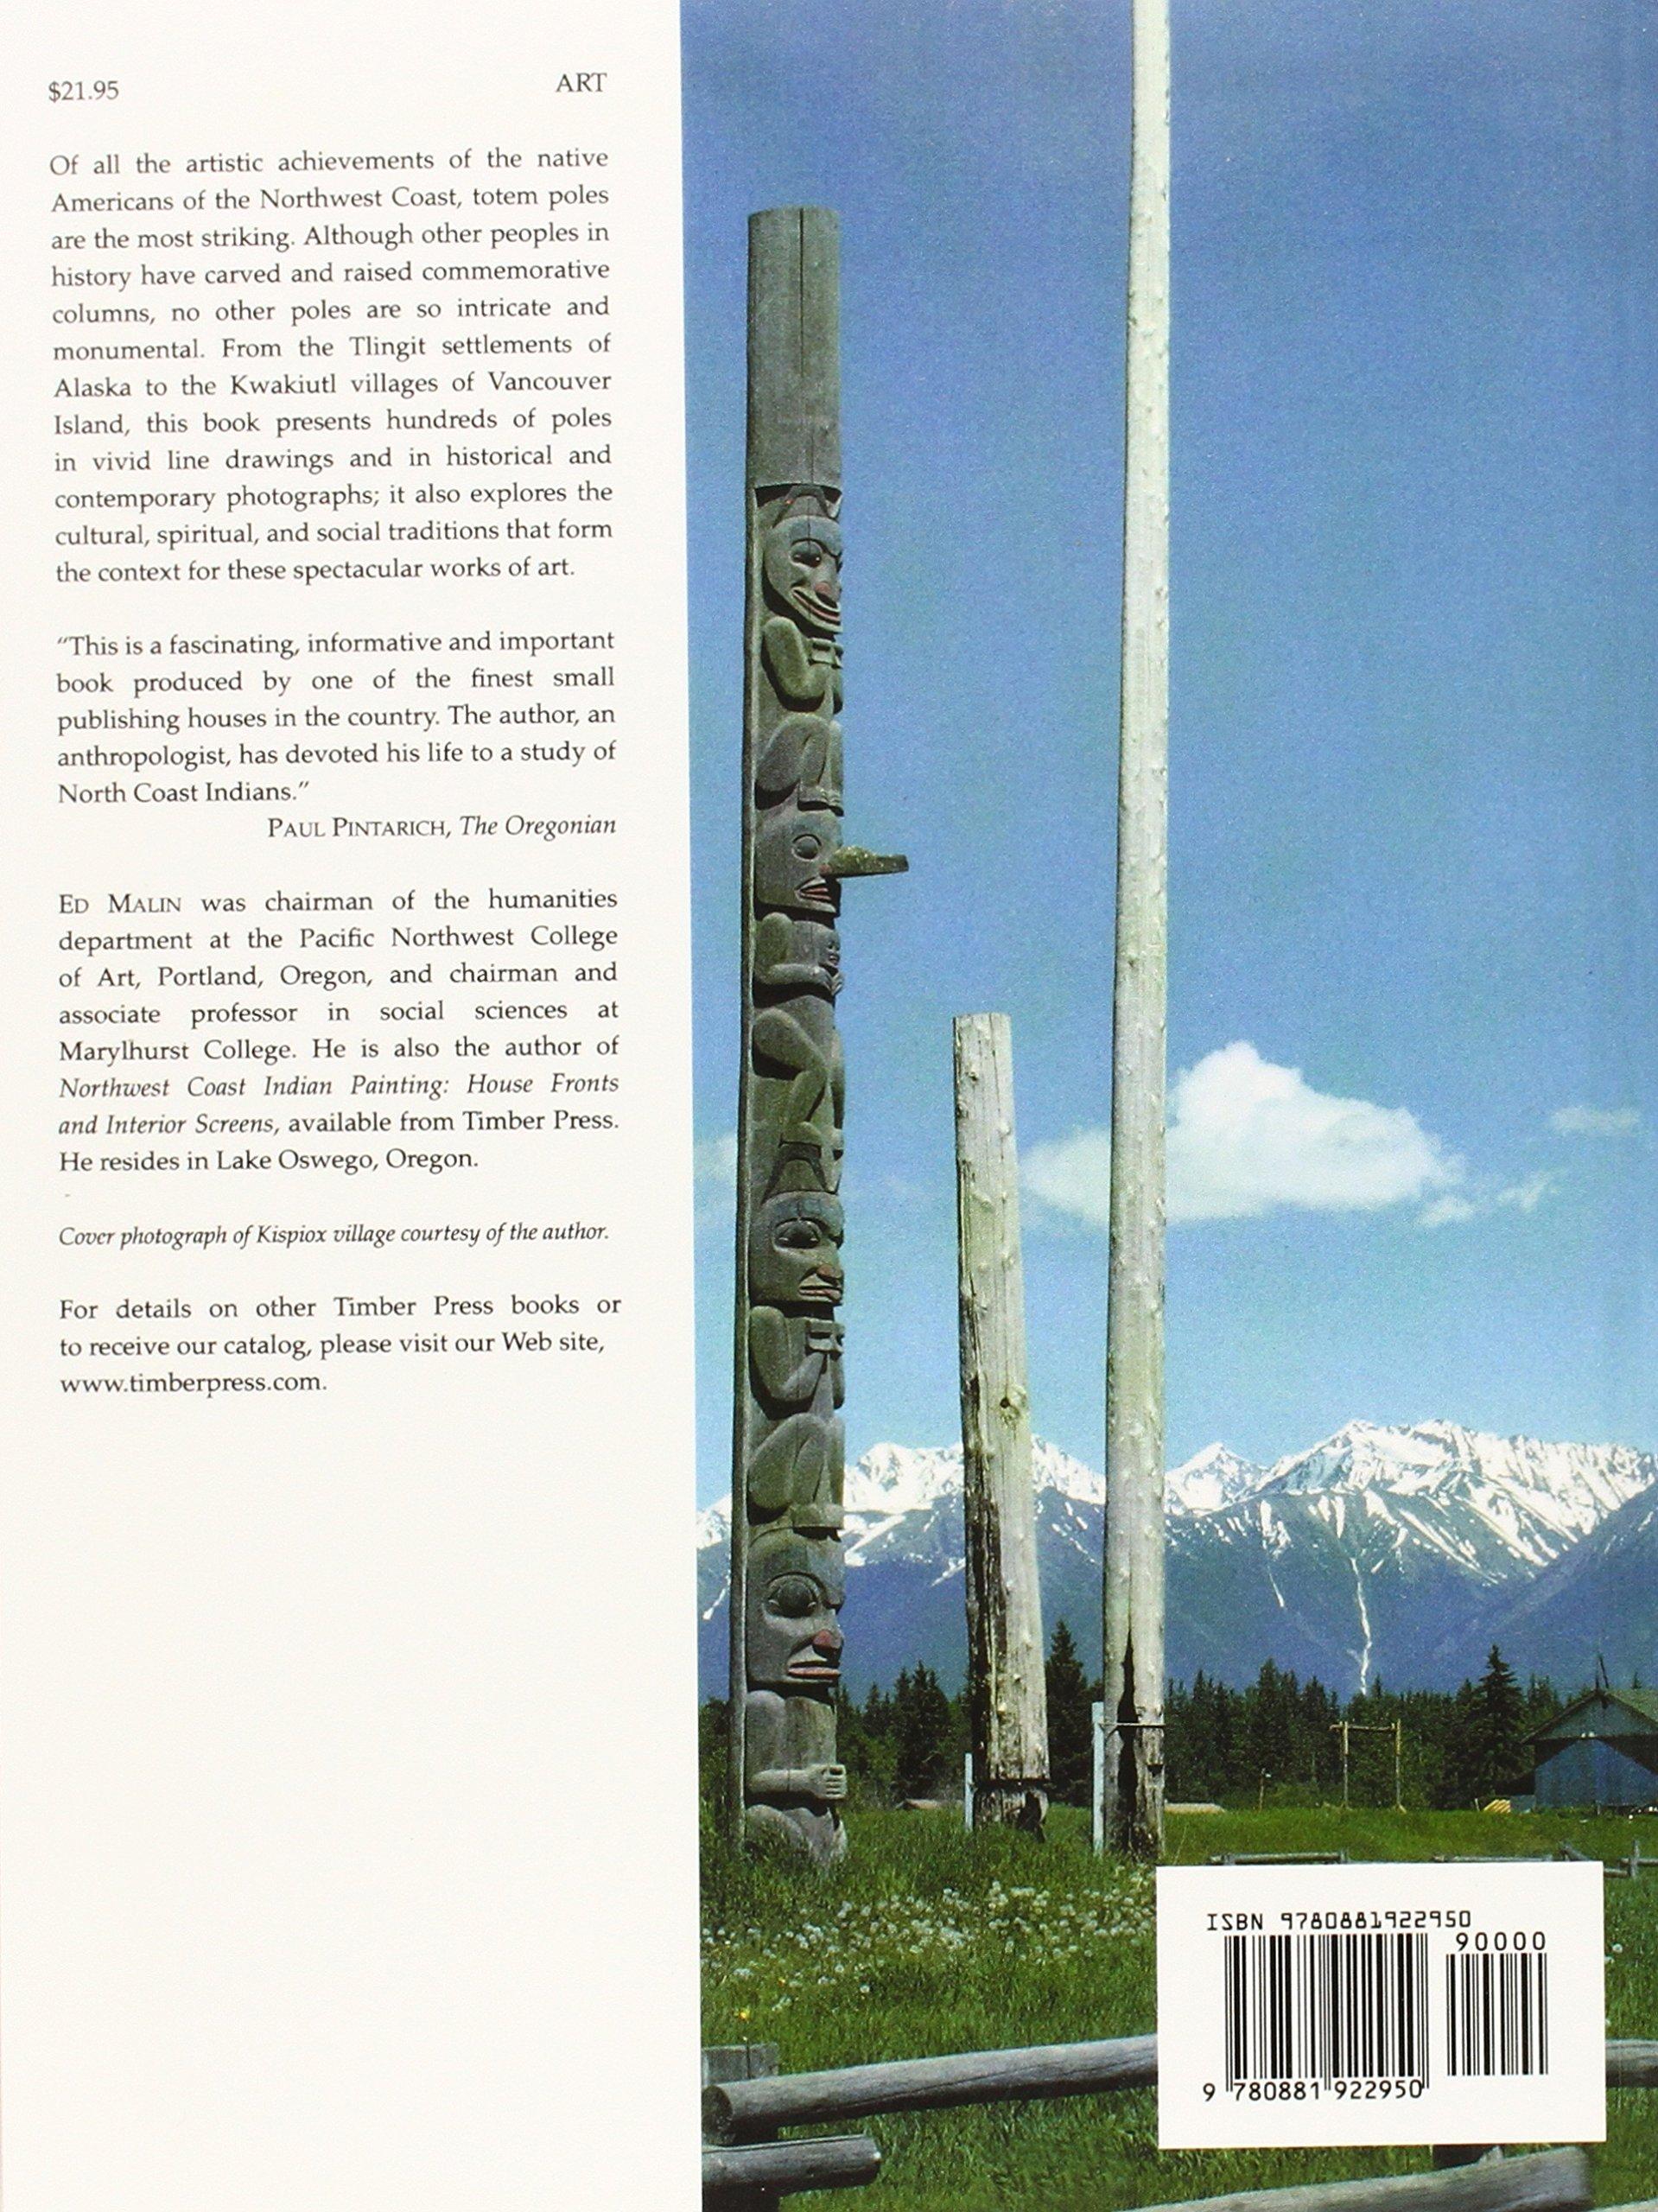 totem poles of the pacific northwest coast edward malin